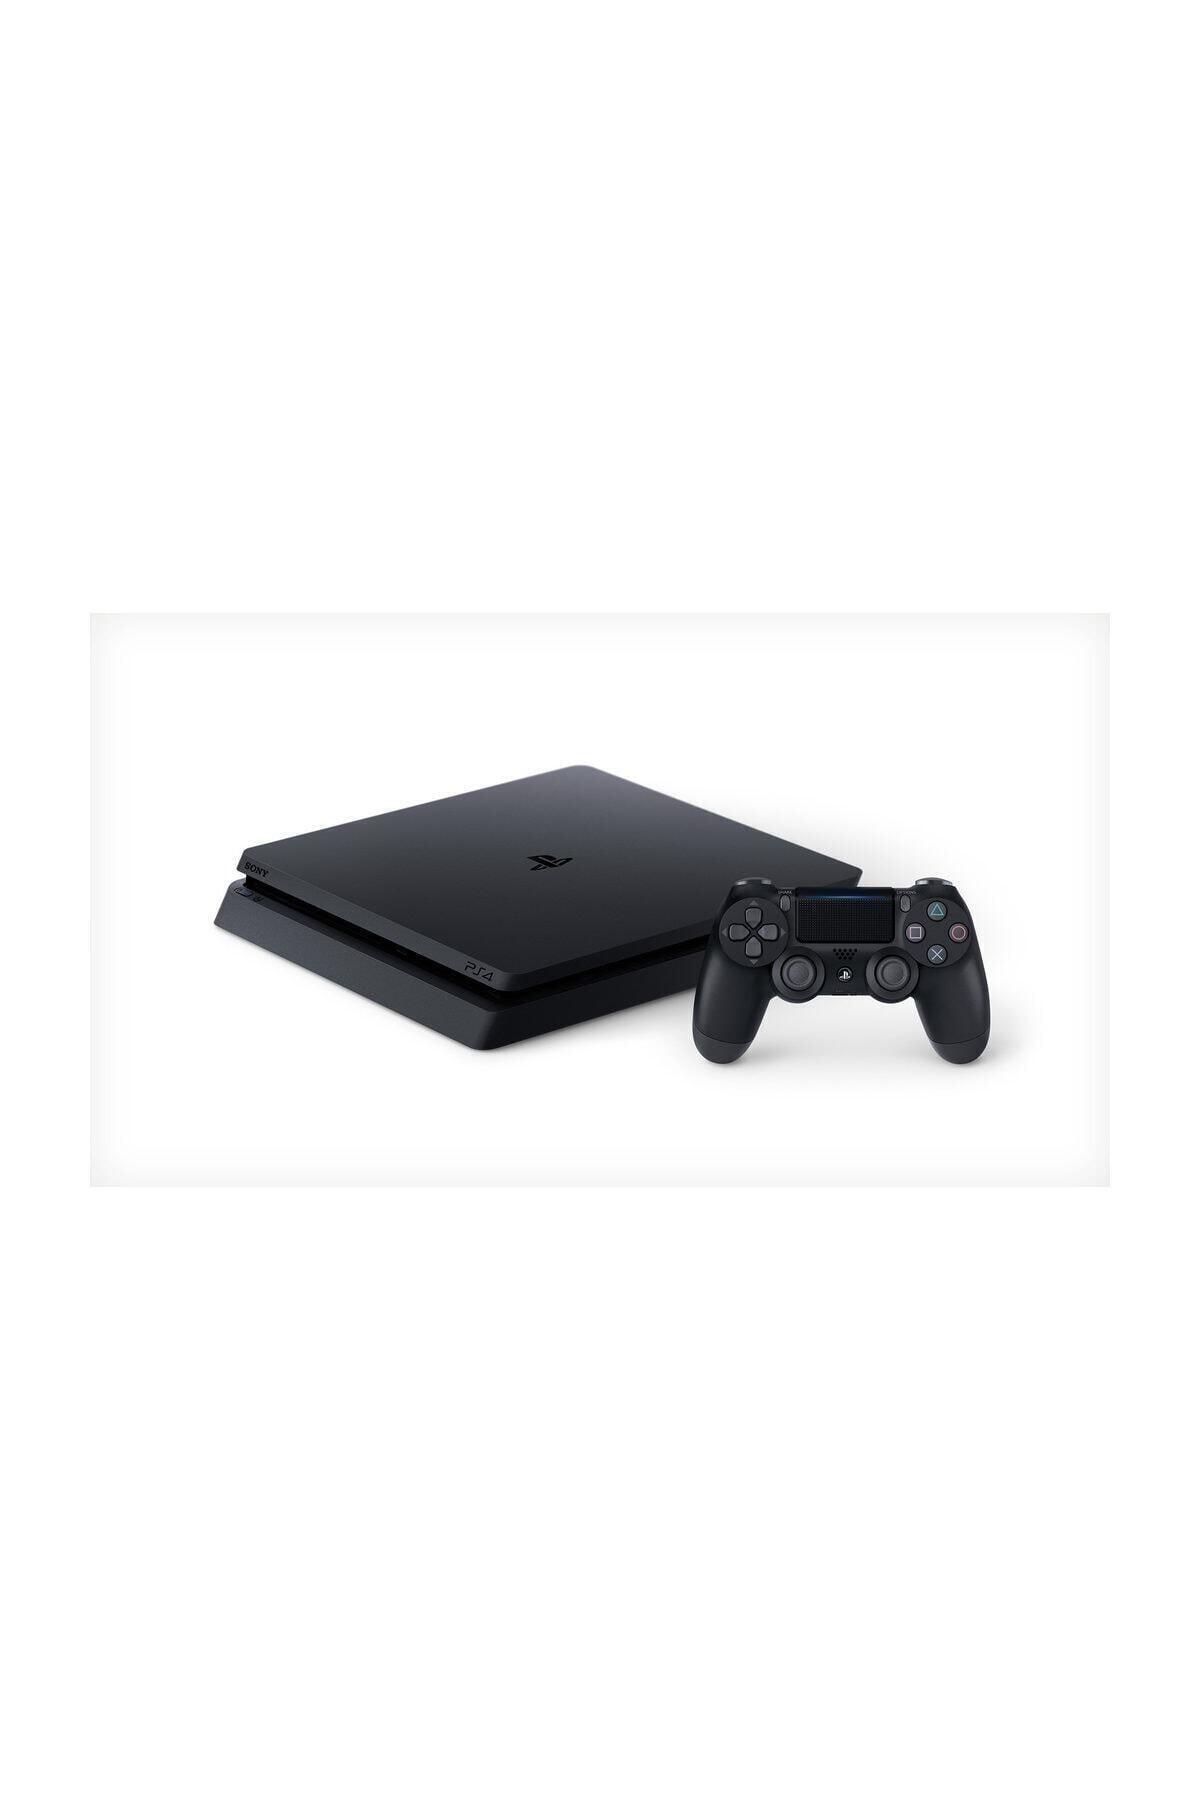 Sony Playstation 4 Slim 500 Gb + Gta V + Days Gone + God Of War + Psn (eurasia Garantili) 2